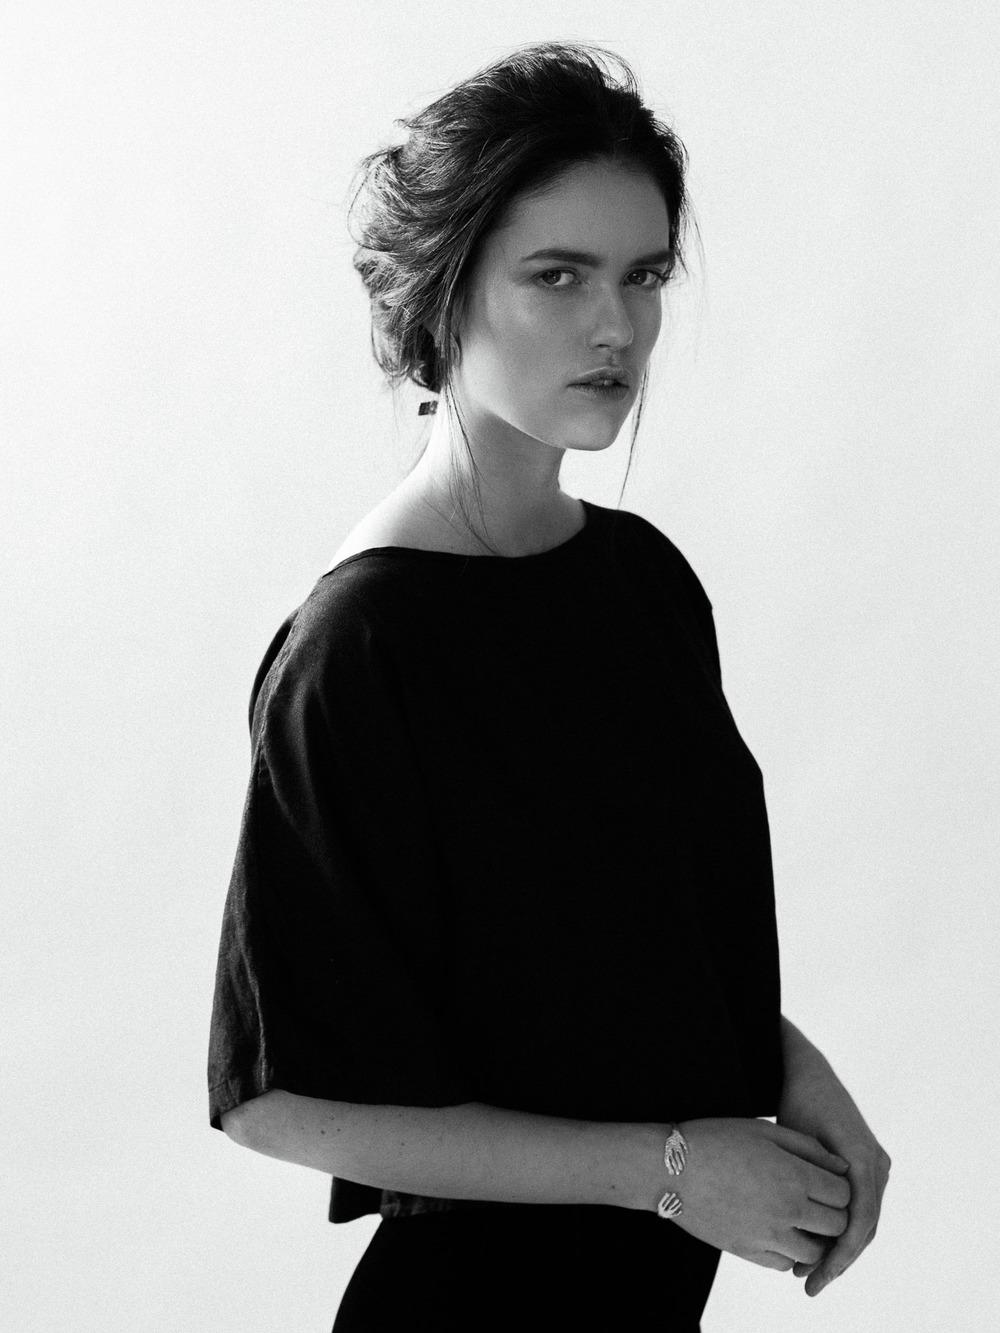 Photographer Jon Duenas. Stylist Kate Rutter.